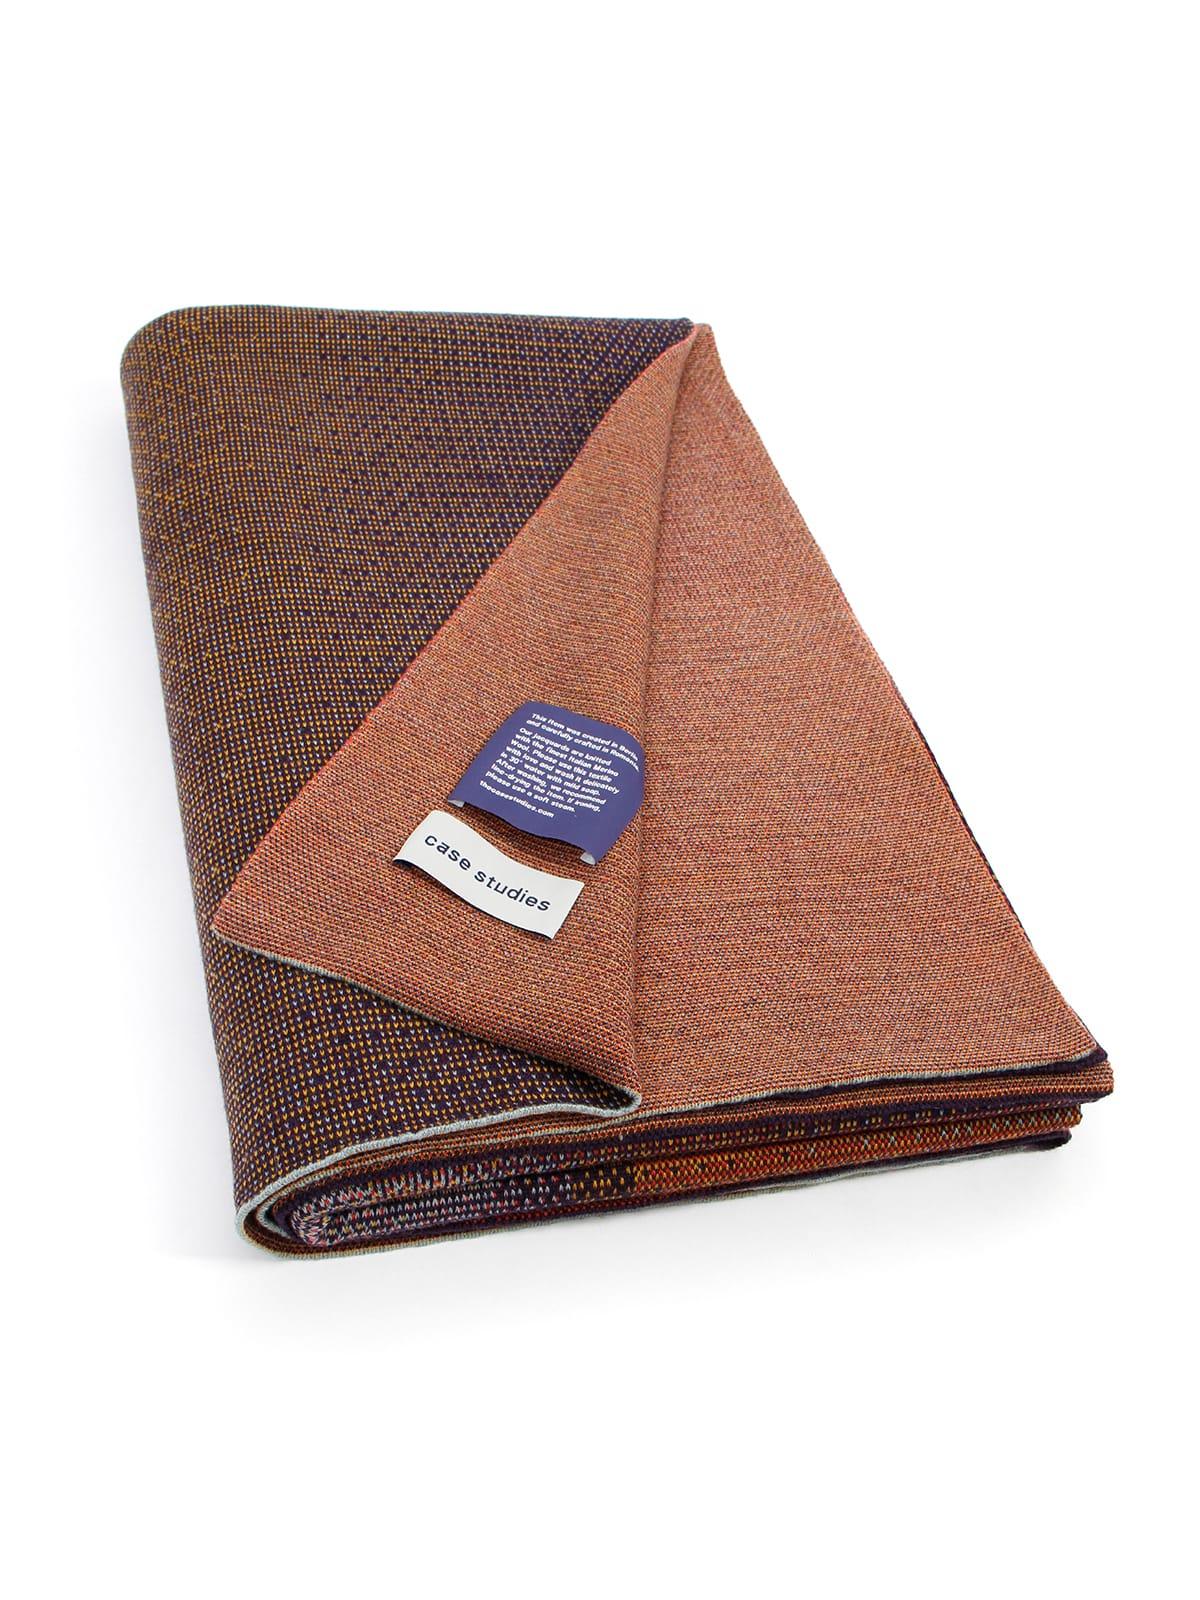 Knitted Blanket Musselshell - Merino Wool folded